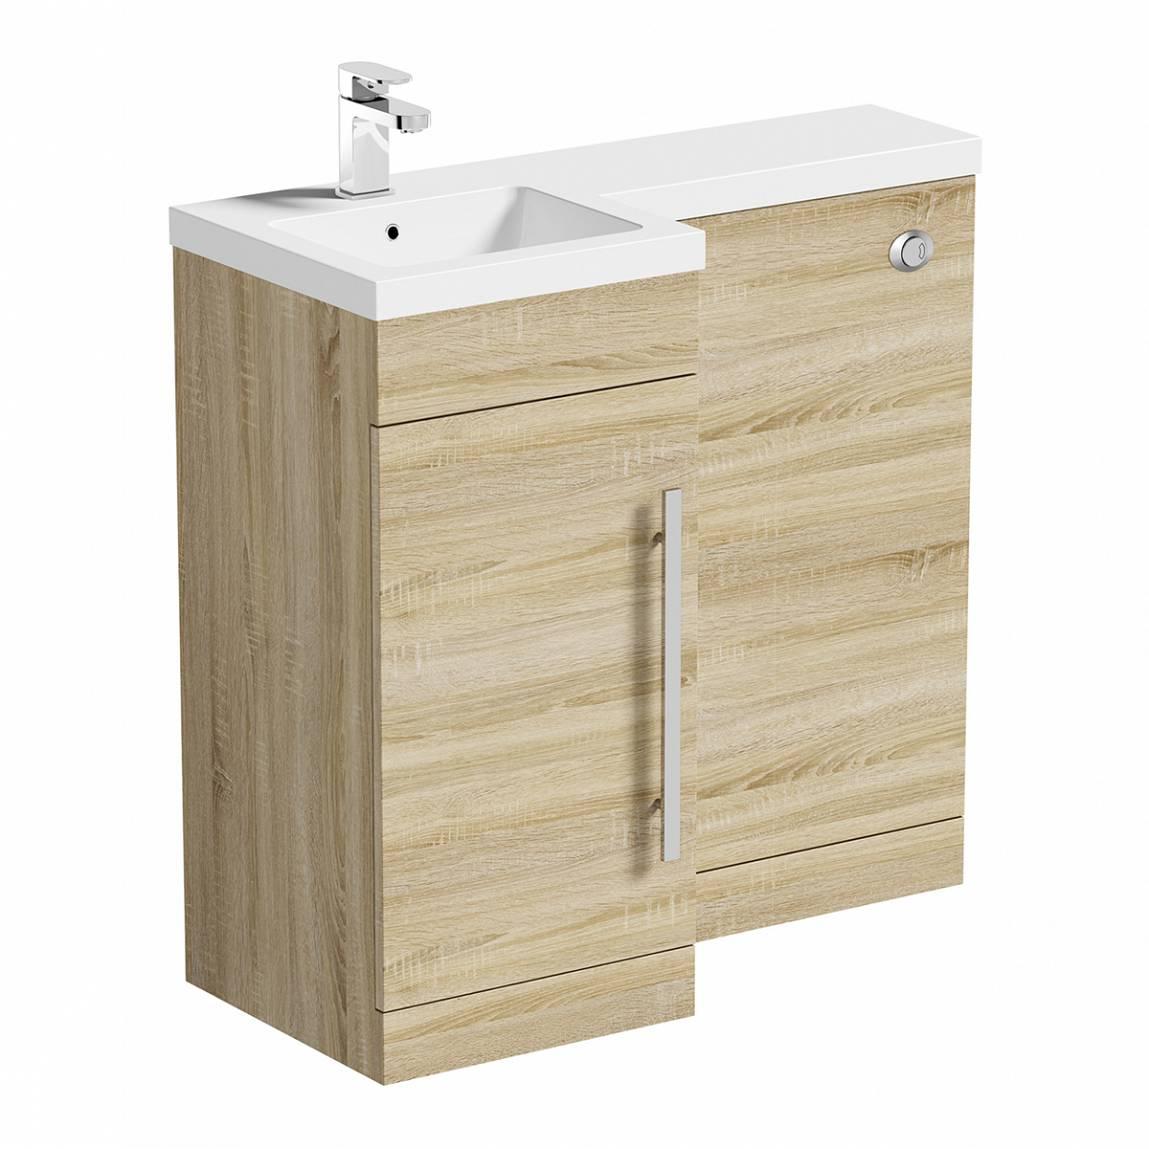 Image of MySpace Oak Combination Unit LH including Concealed Cistern